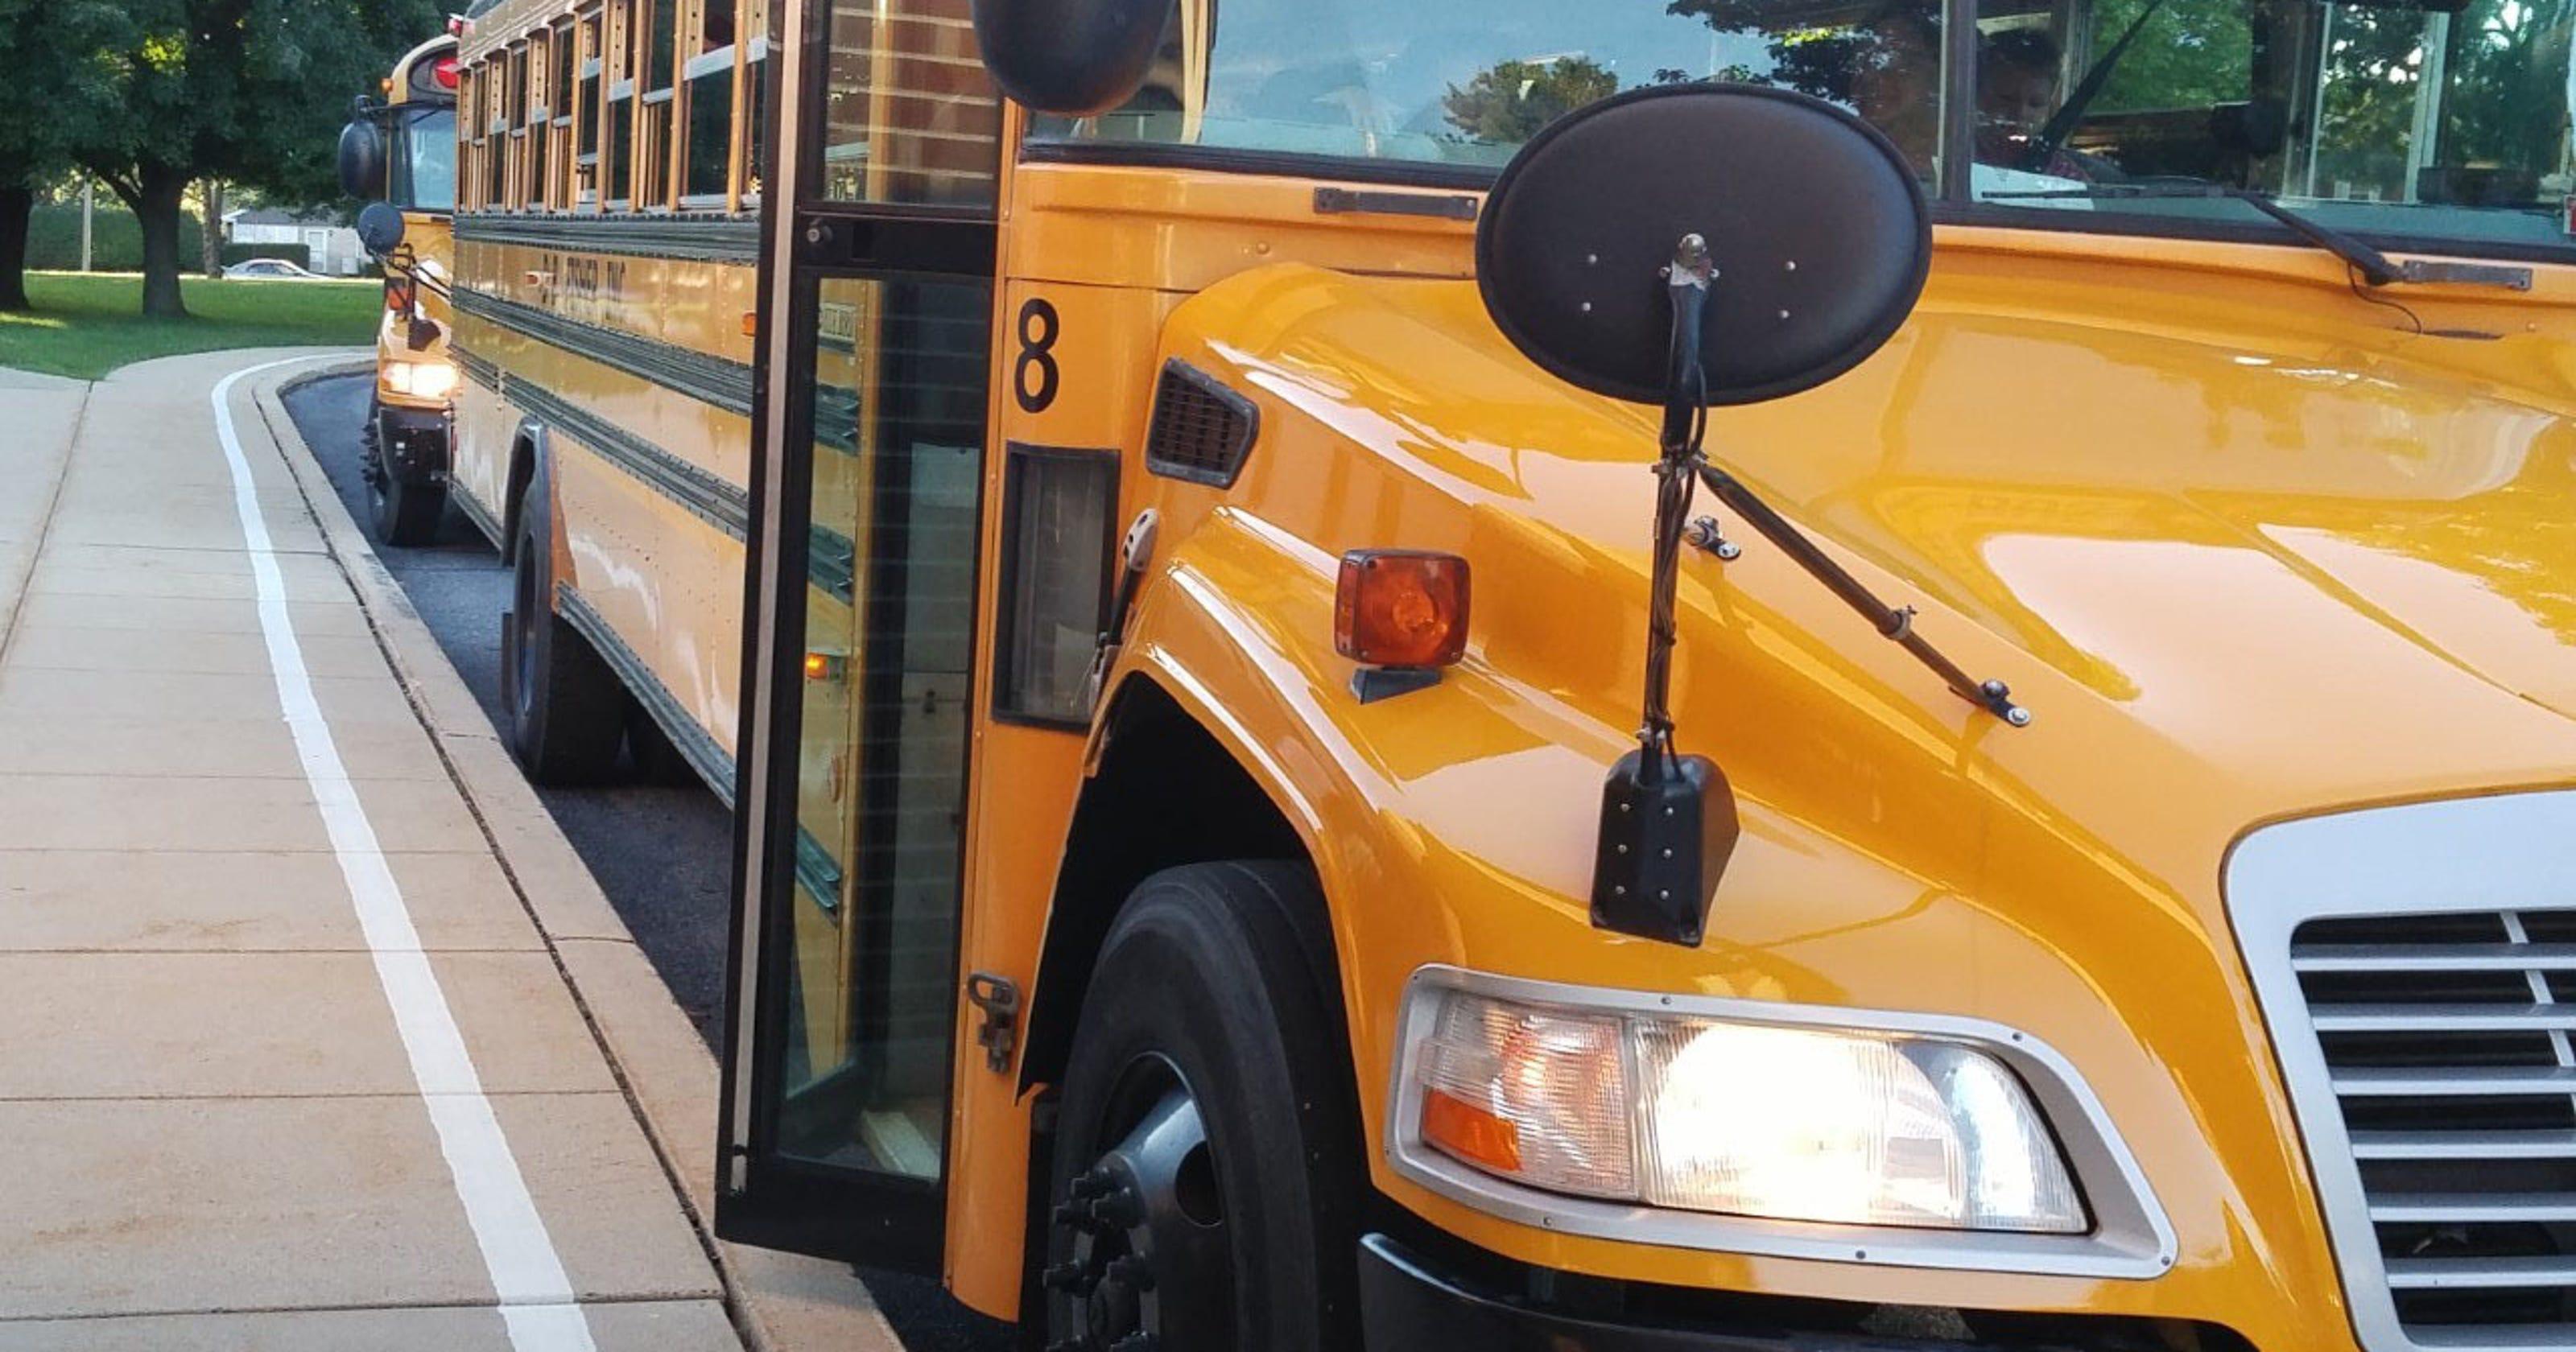 Lebanon County school bus companies scramble to find drivers